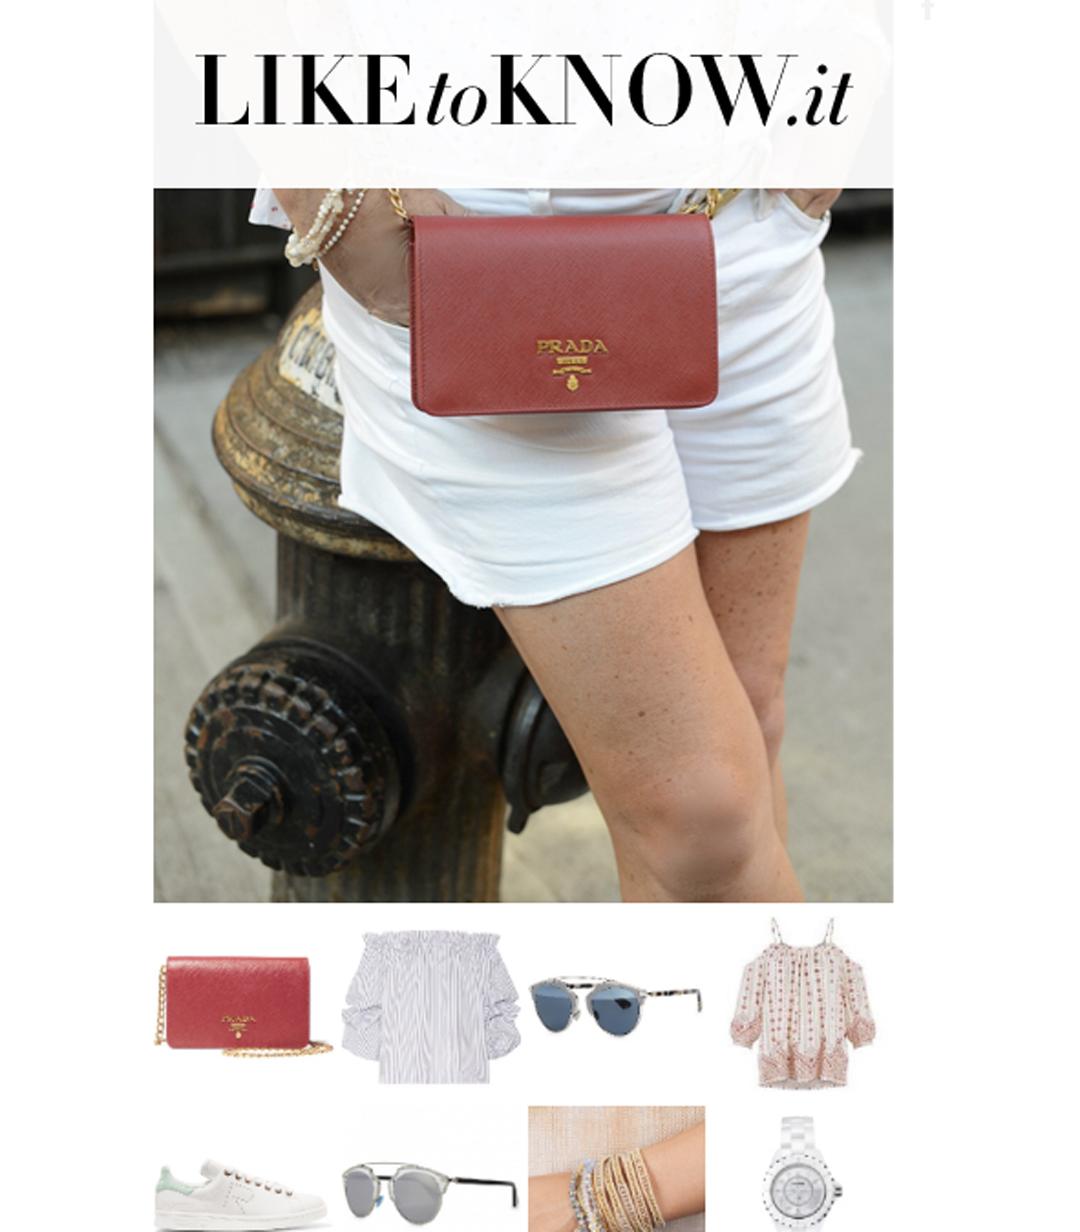 shop your instagram with LIKEtoKNOW.it